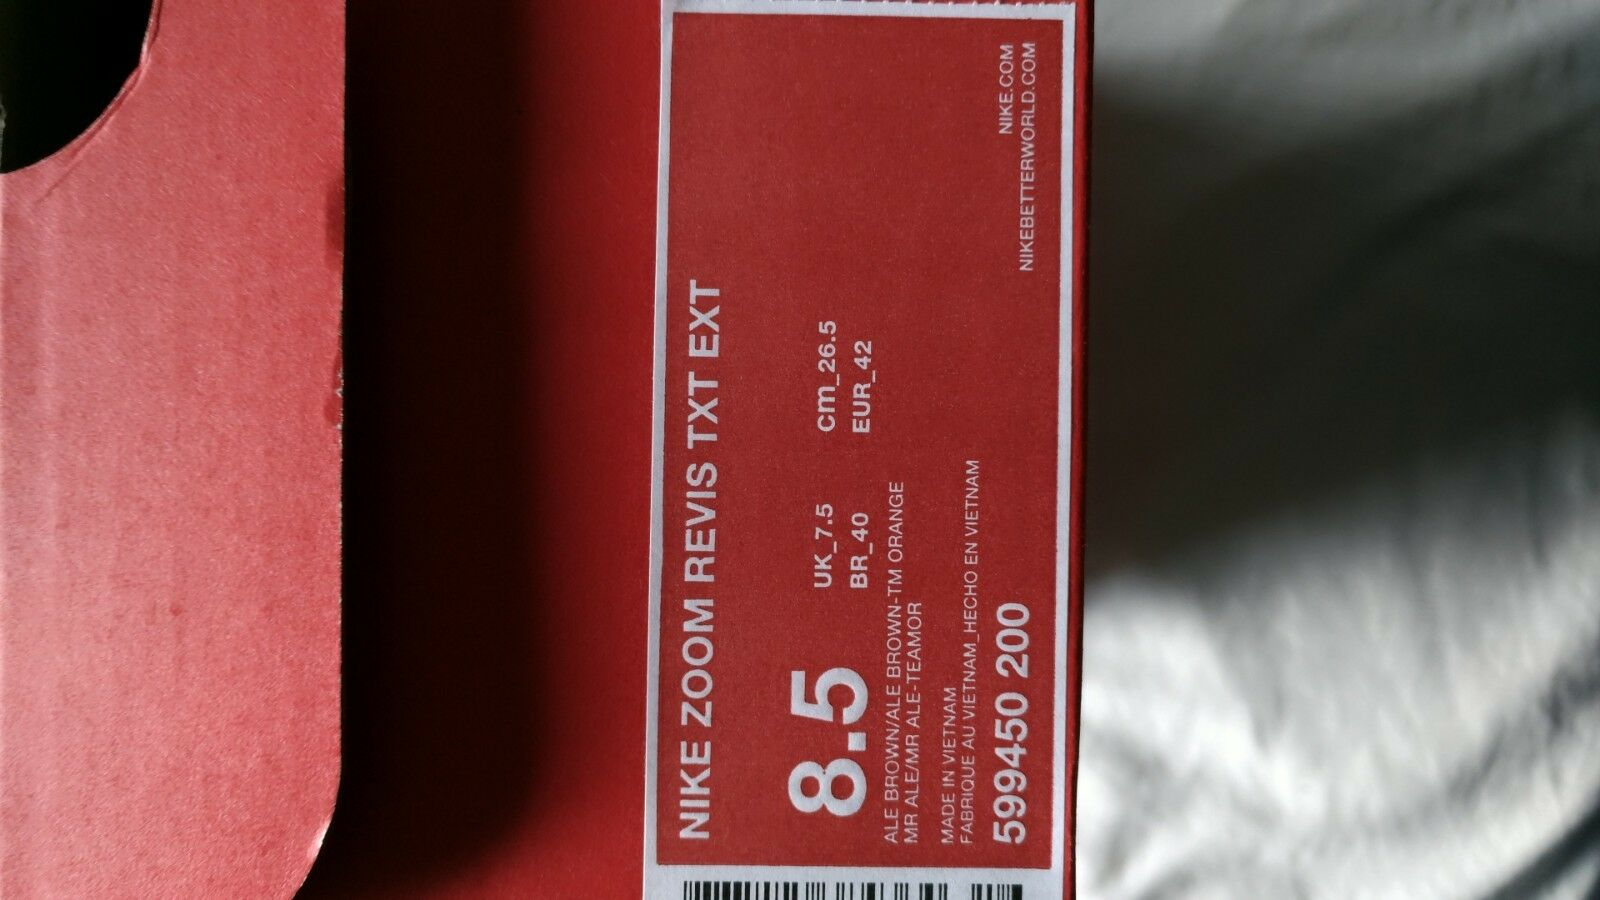 Nike Zoom Revis TXT EXT size 8.5 8.5 8.5 NY Jets NFL 599450 200 Camo Brown orange ed6934